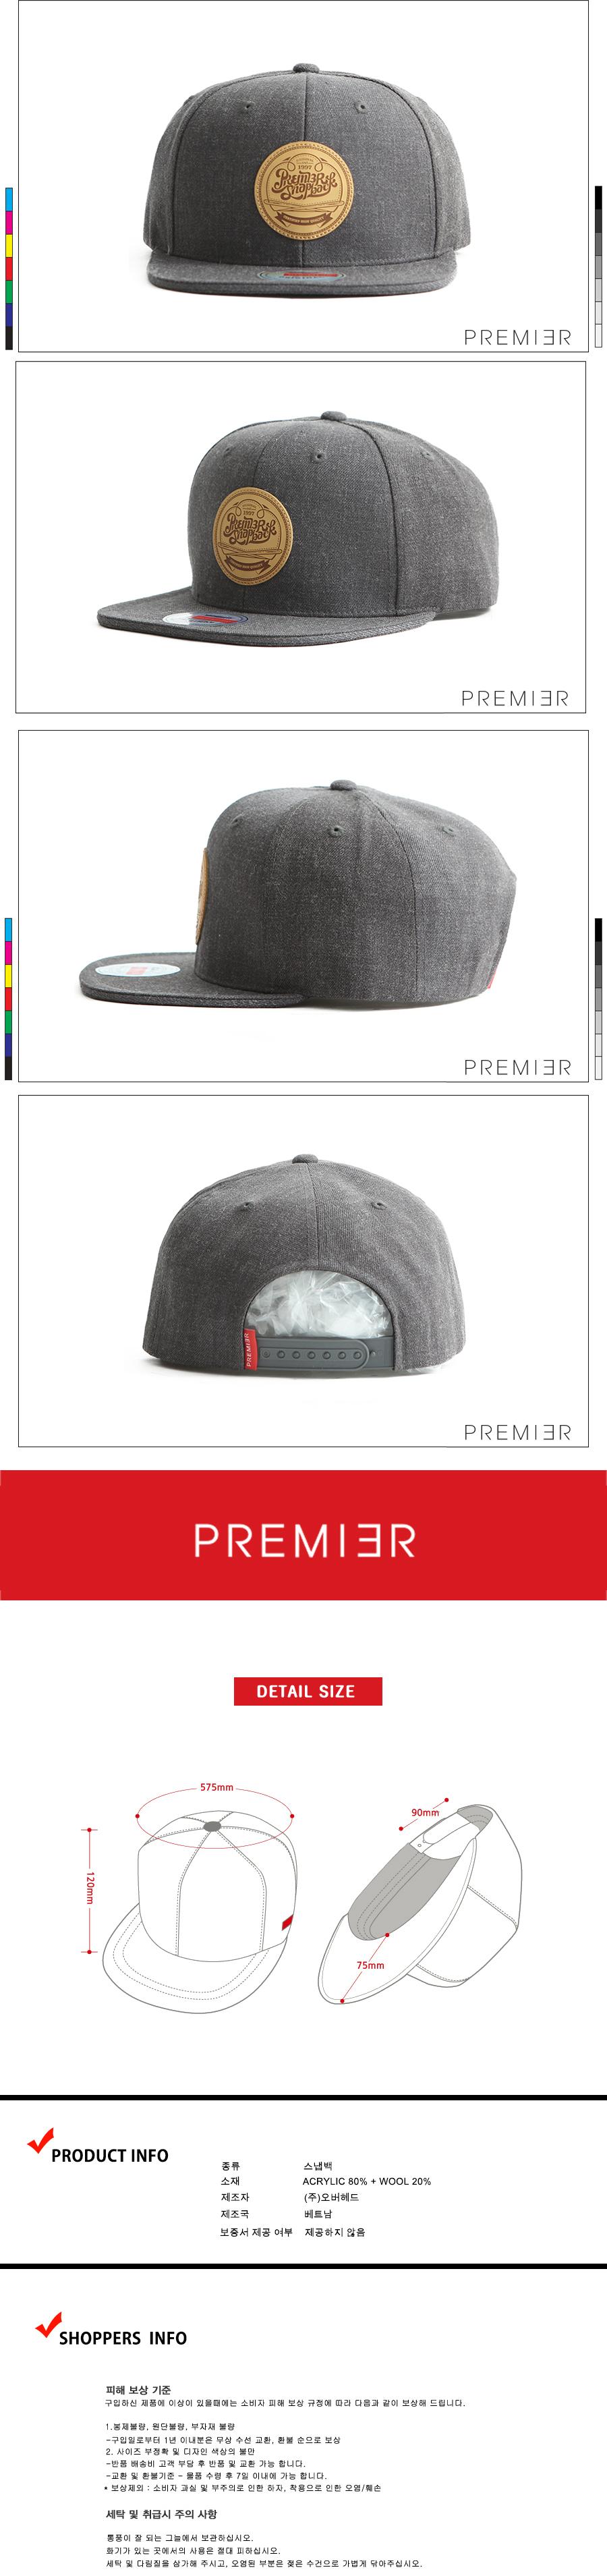 [ PREMIER ] [Premier] Snapback Heat Printing Circle Grey (P895)